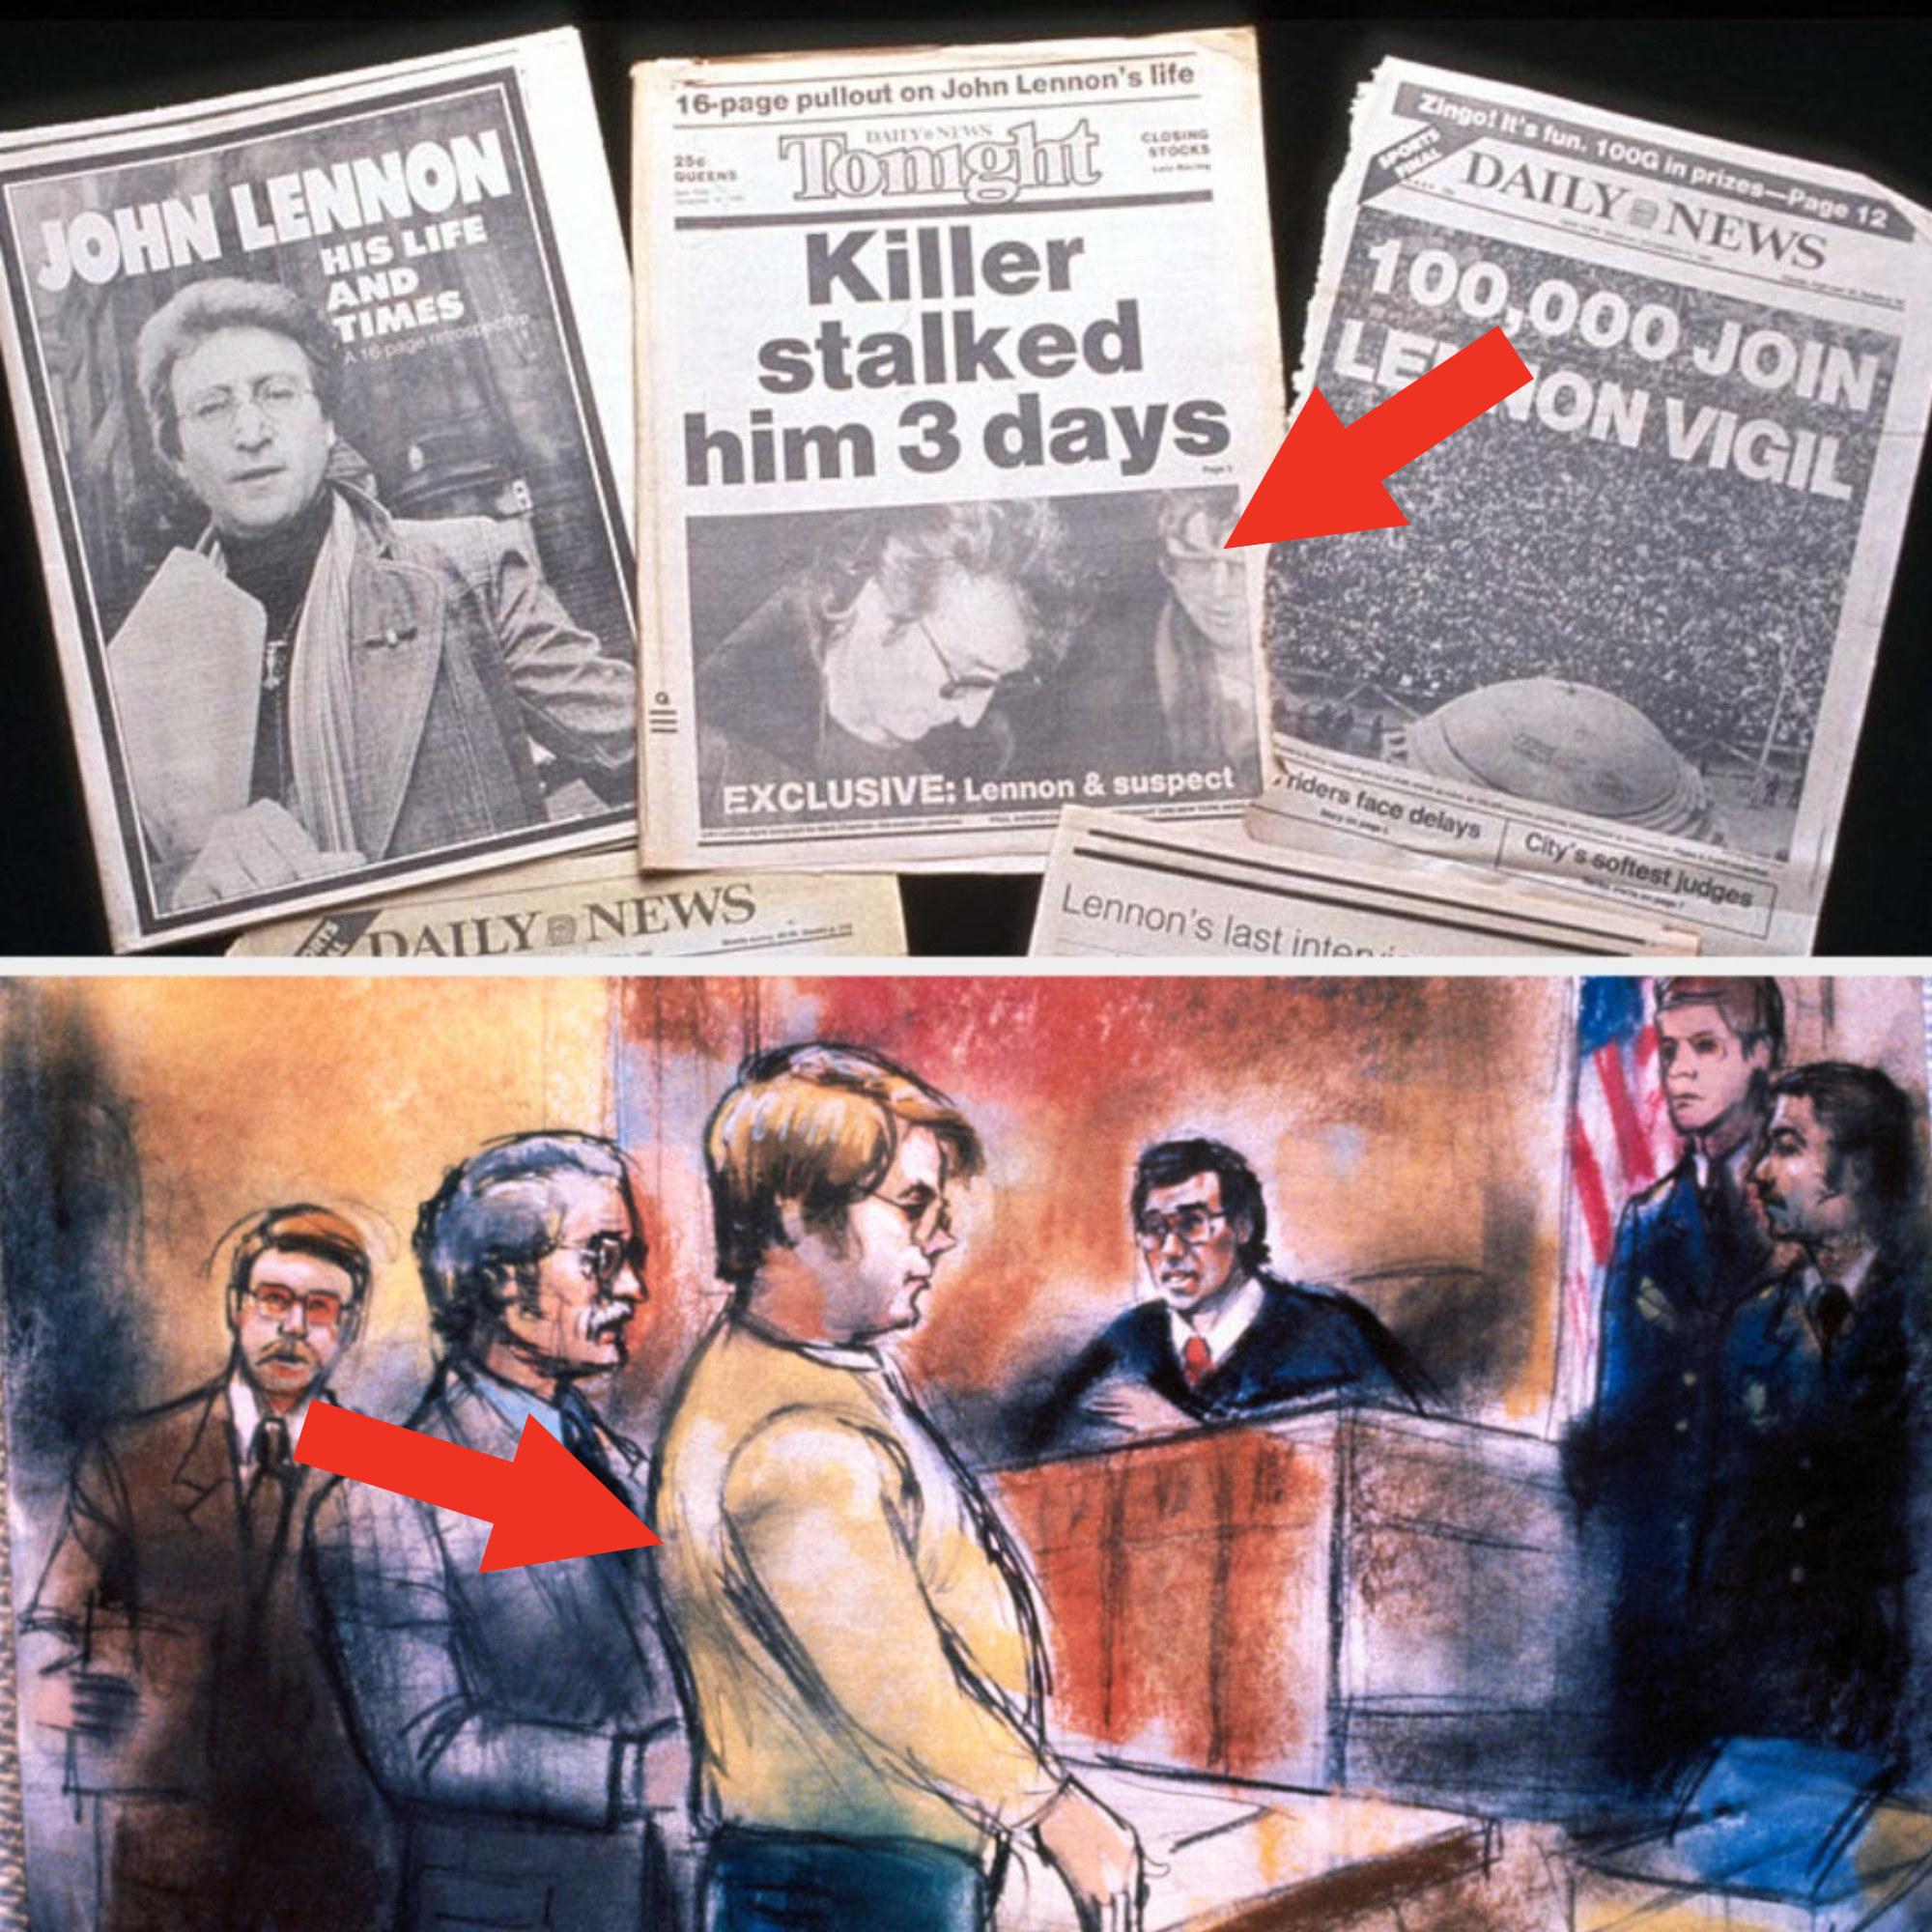 Various newspaper covers of John Lennon's death; courtroom sketch of Lennon's murderer Mark David Chapman